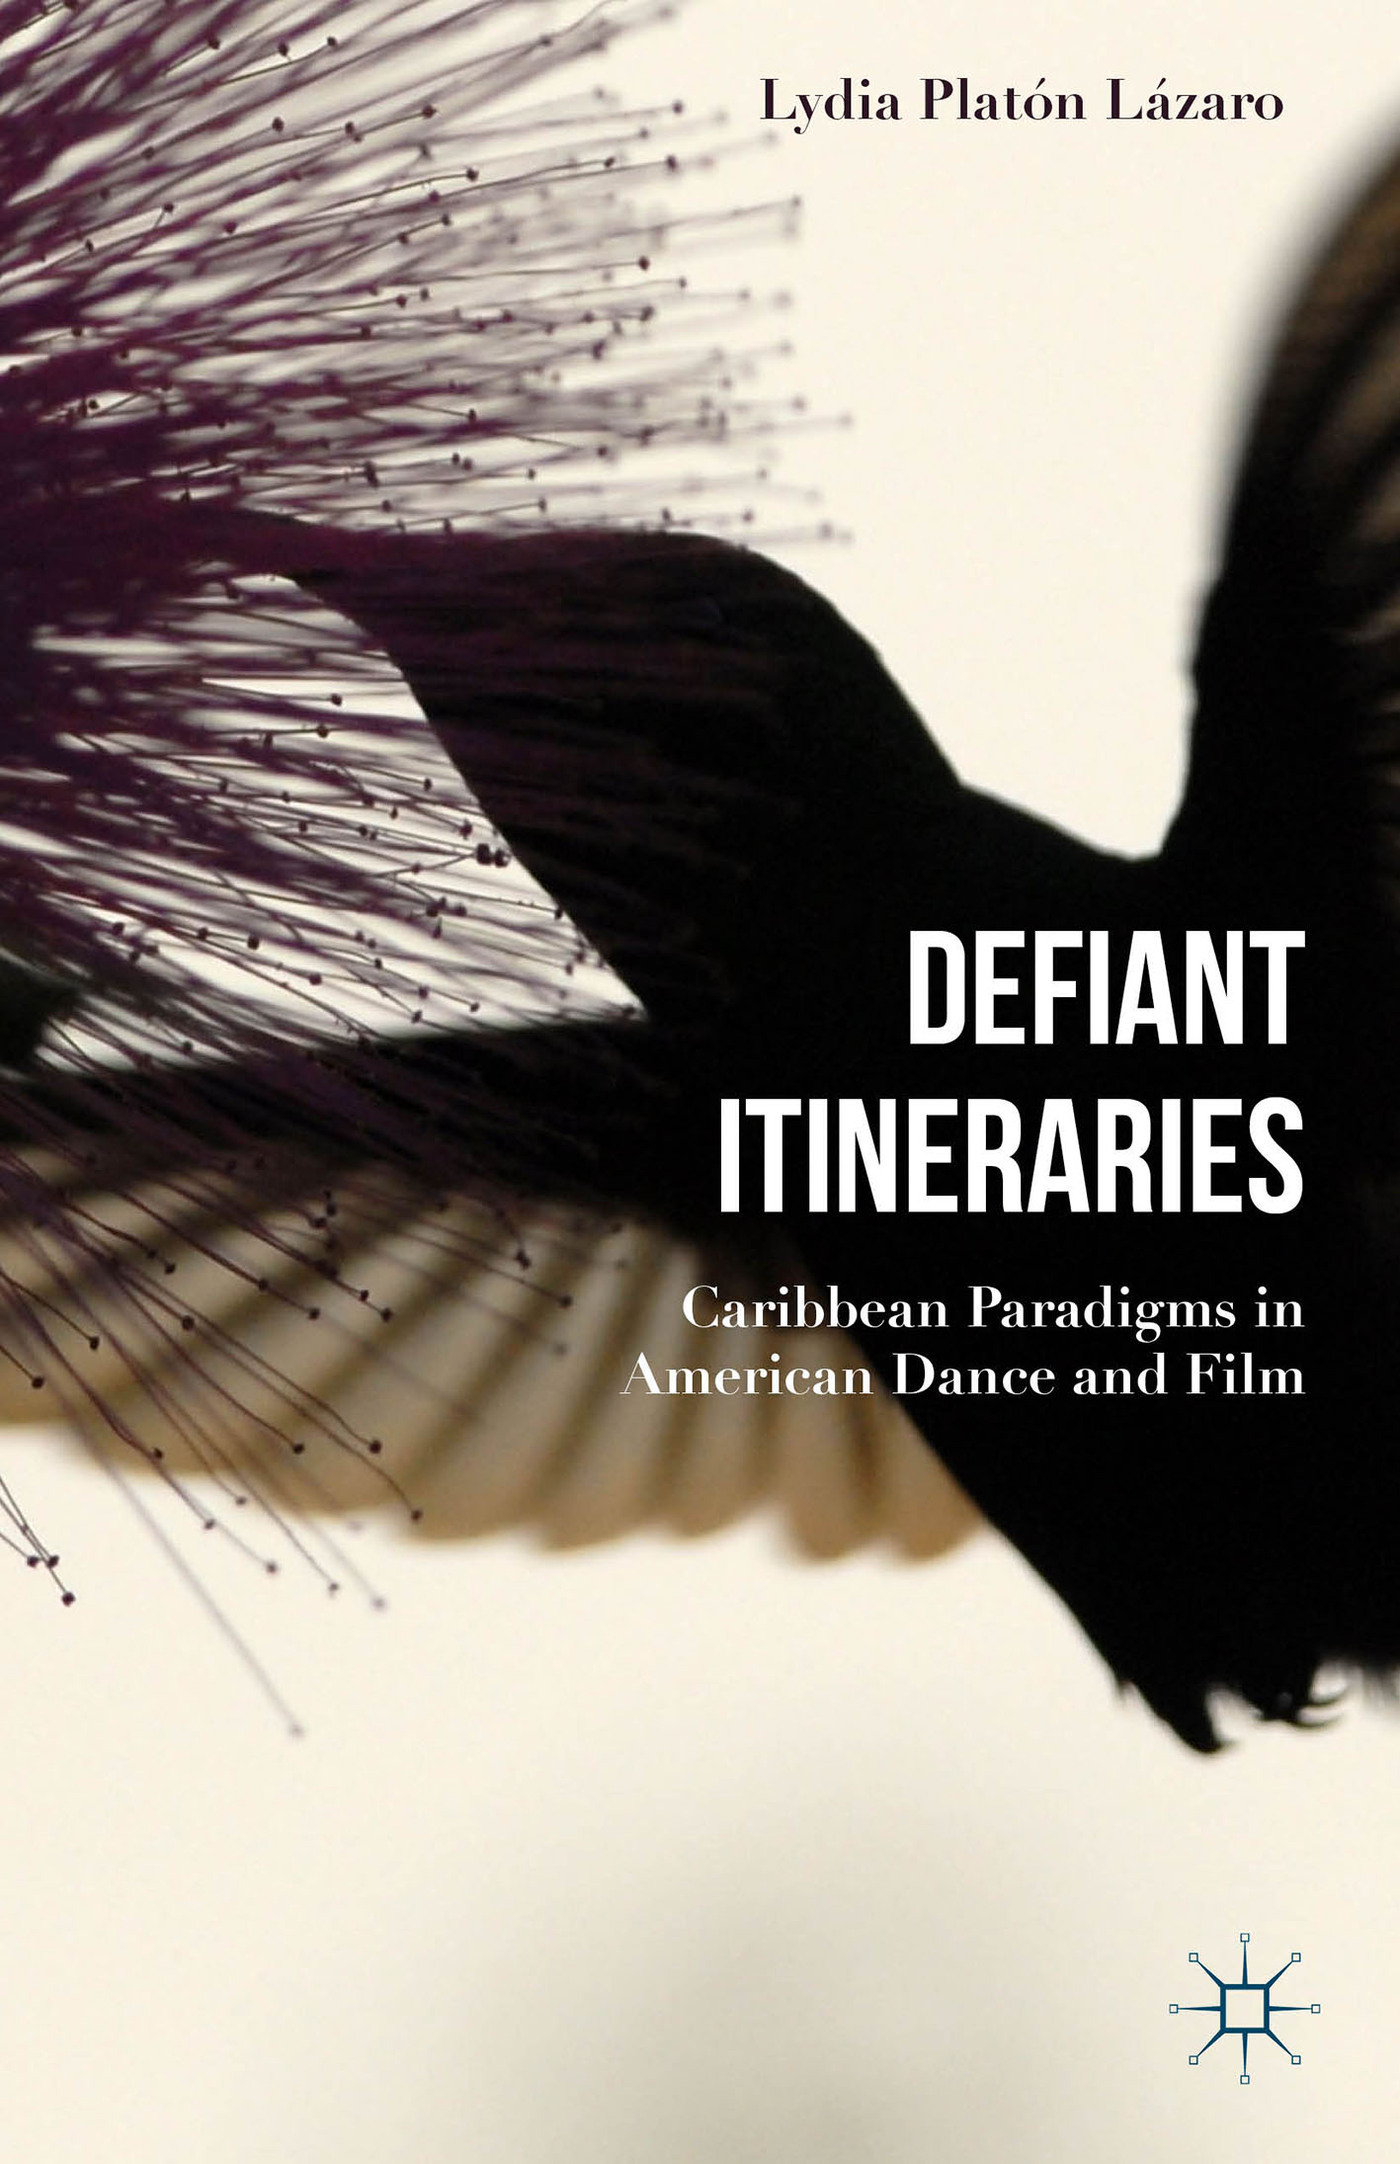 Defiant Itineraries: Caribbean Paradigms in American Dance and Film Lydia Platón Lázaro